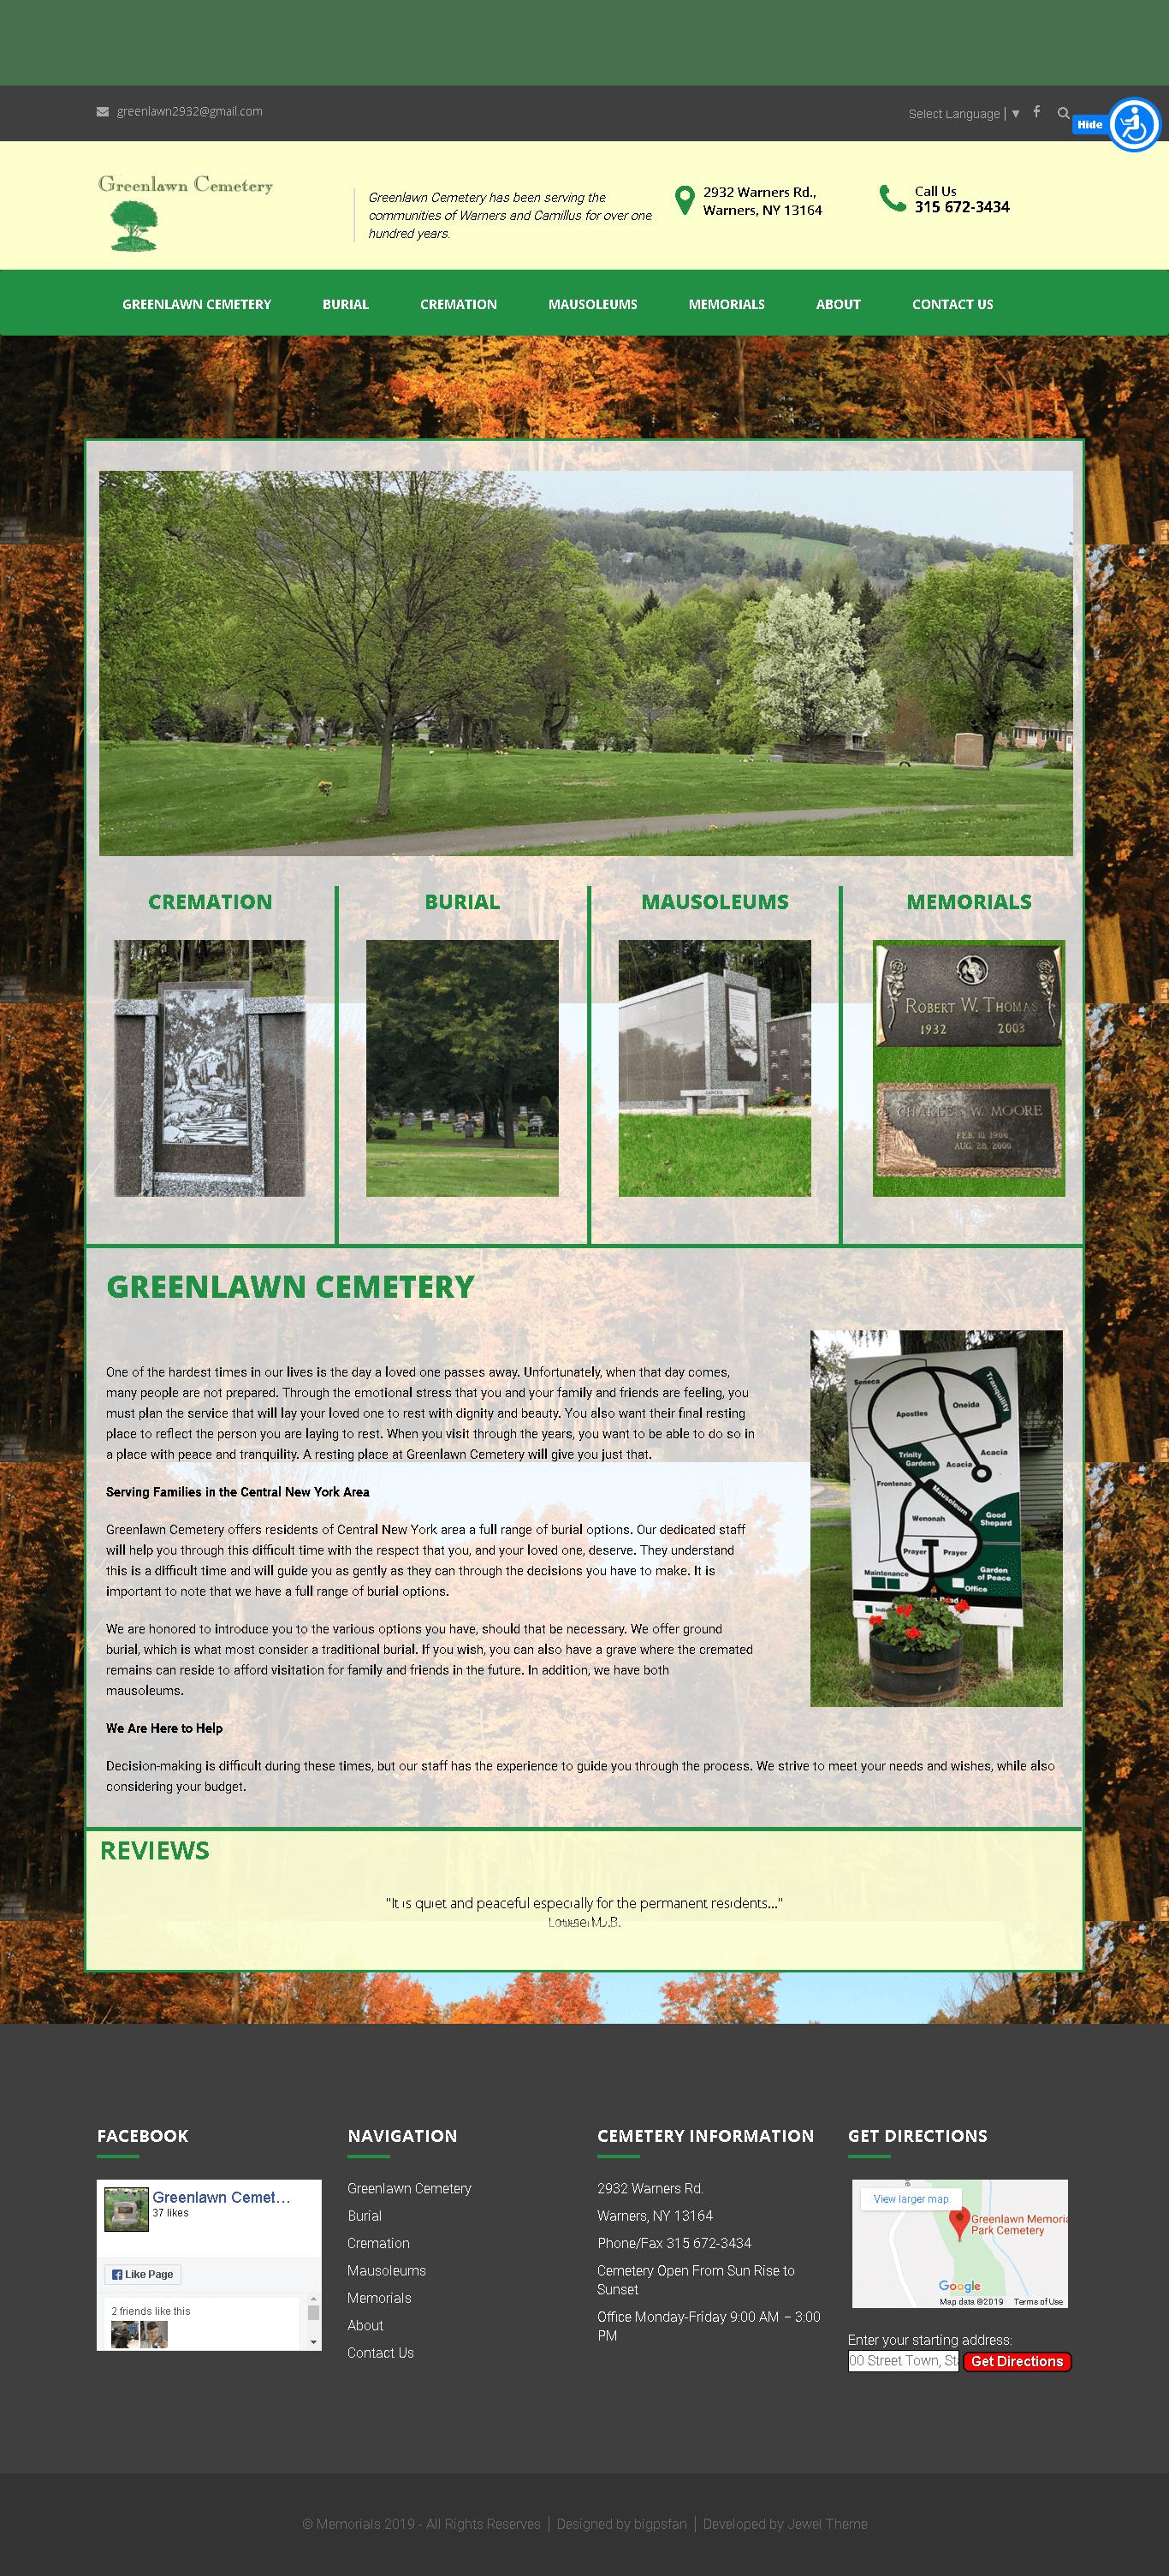 Greenlawn Cemetery Warners NY